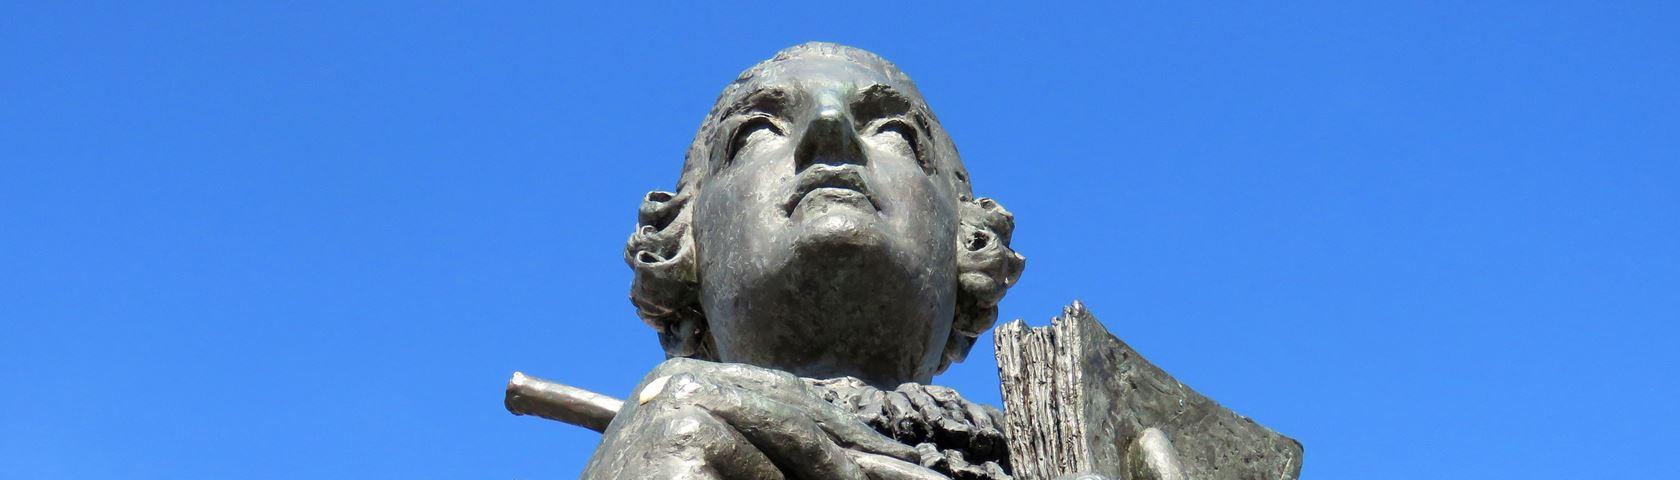 Burano Statue